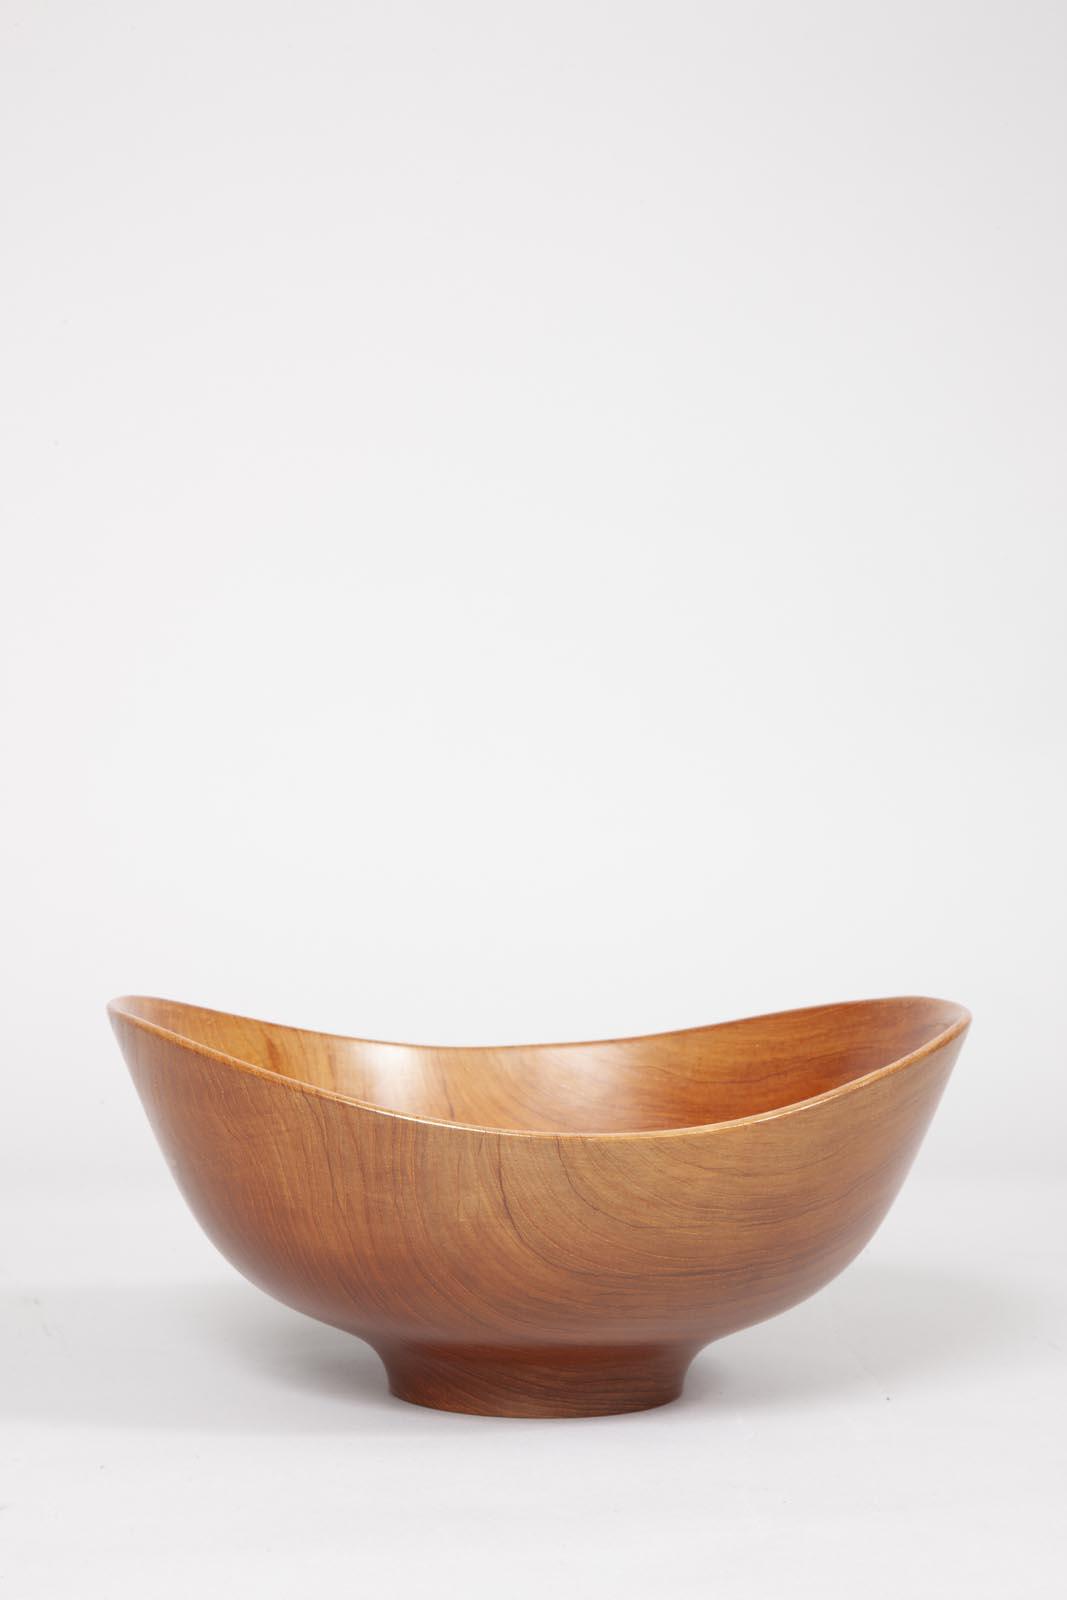 Finn Juhl teak bowl